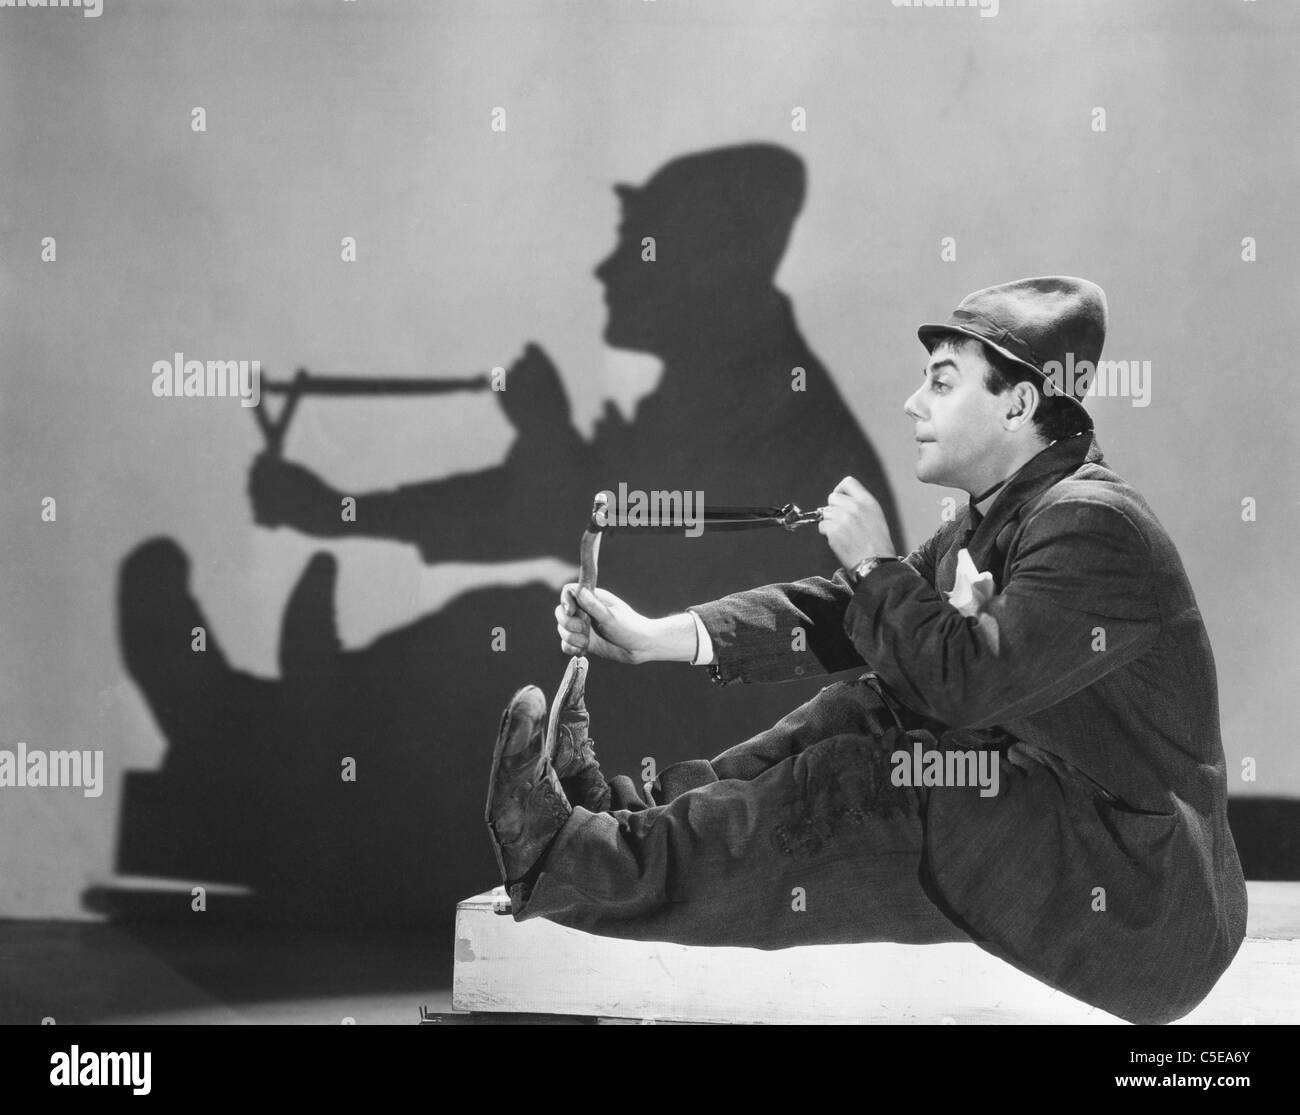 Man aiming slingshot - Stock Image